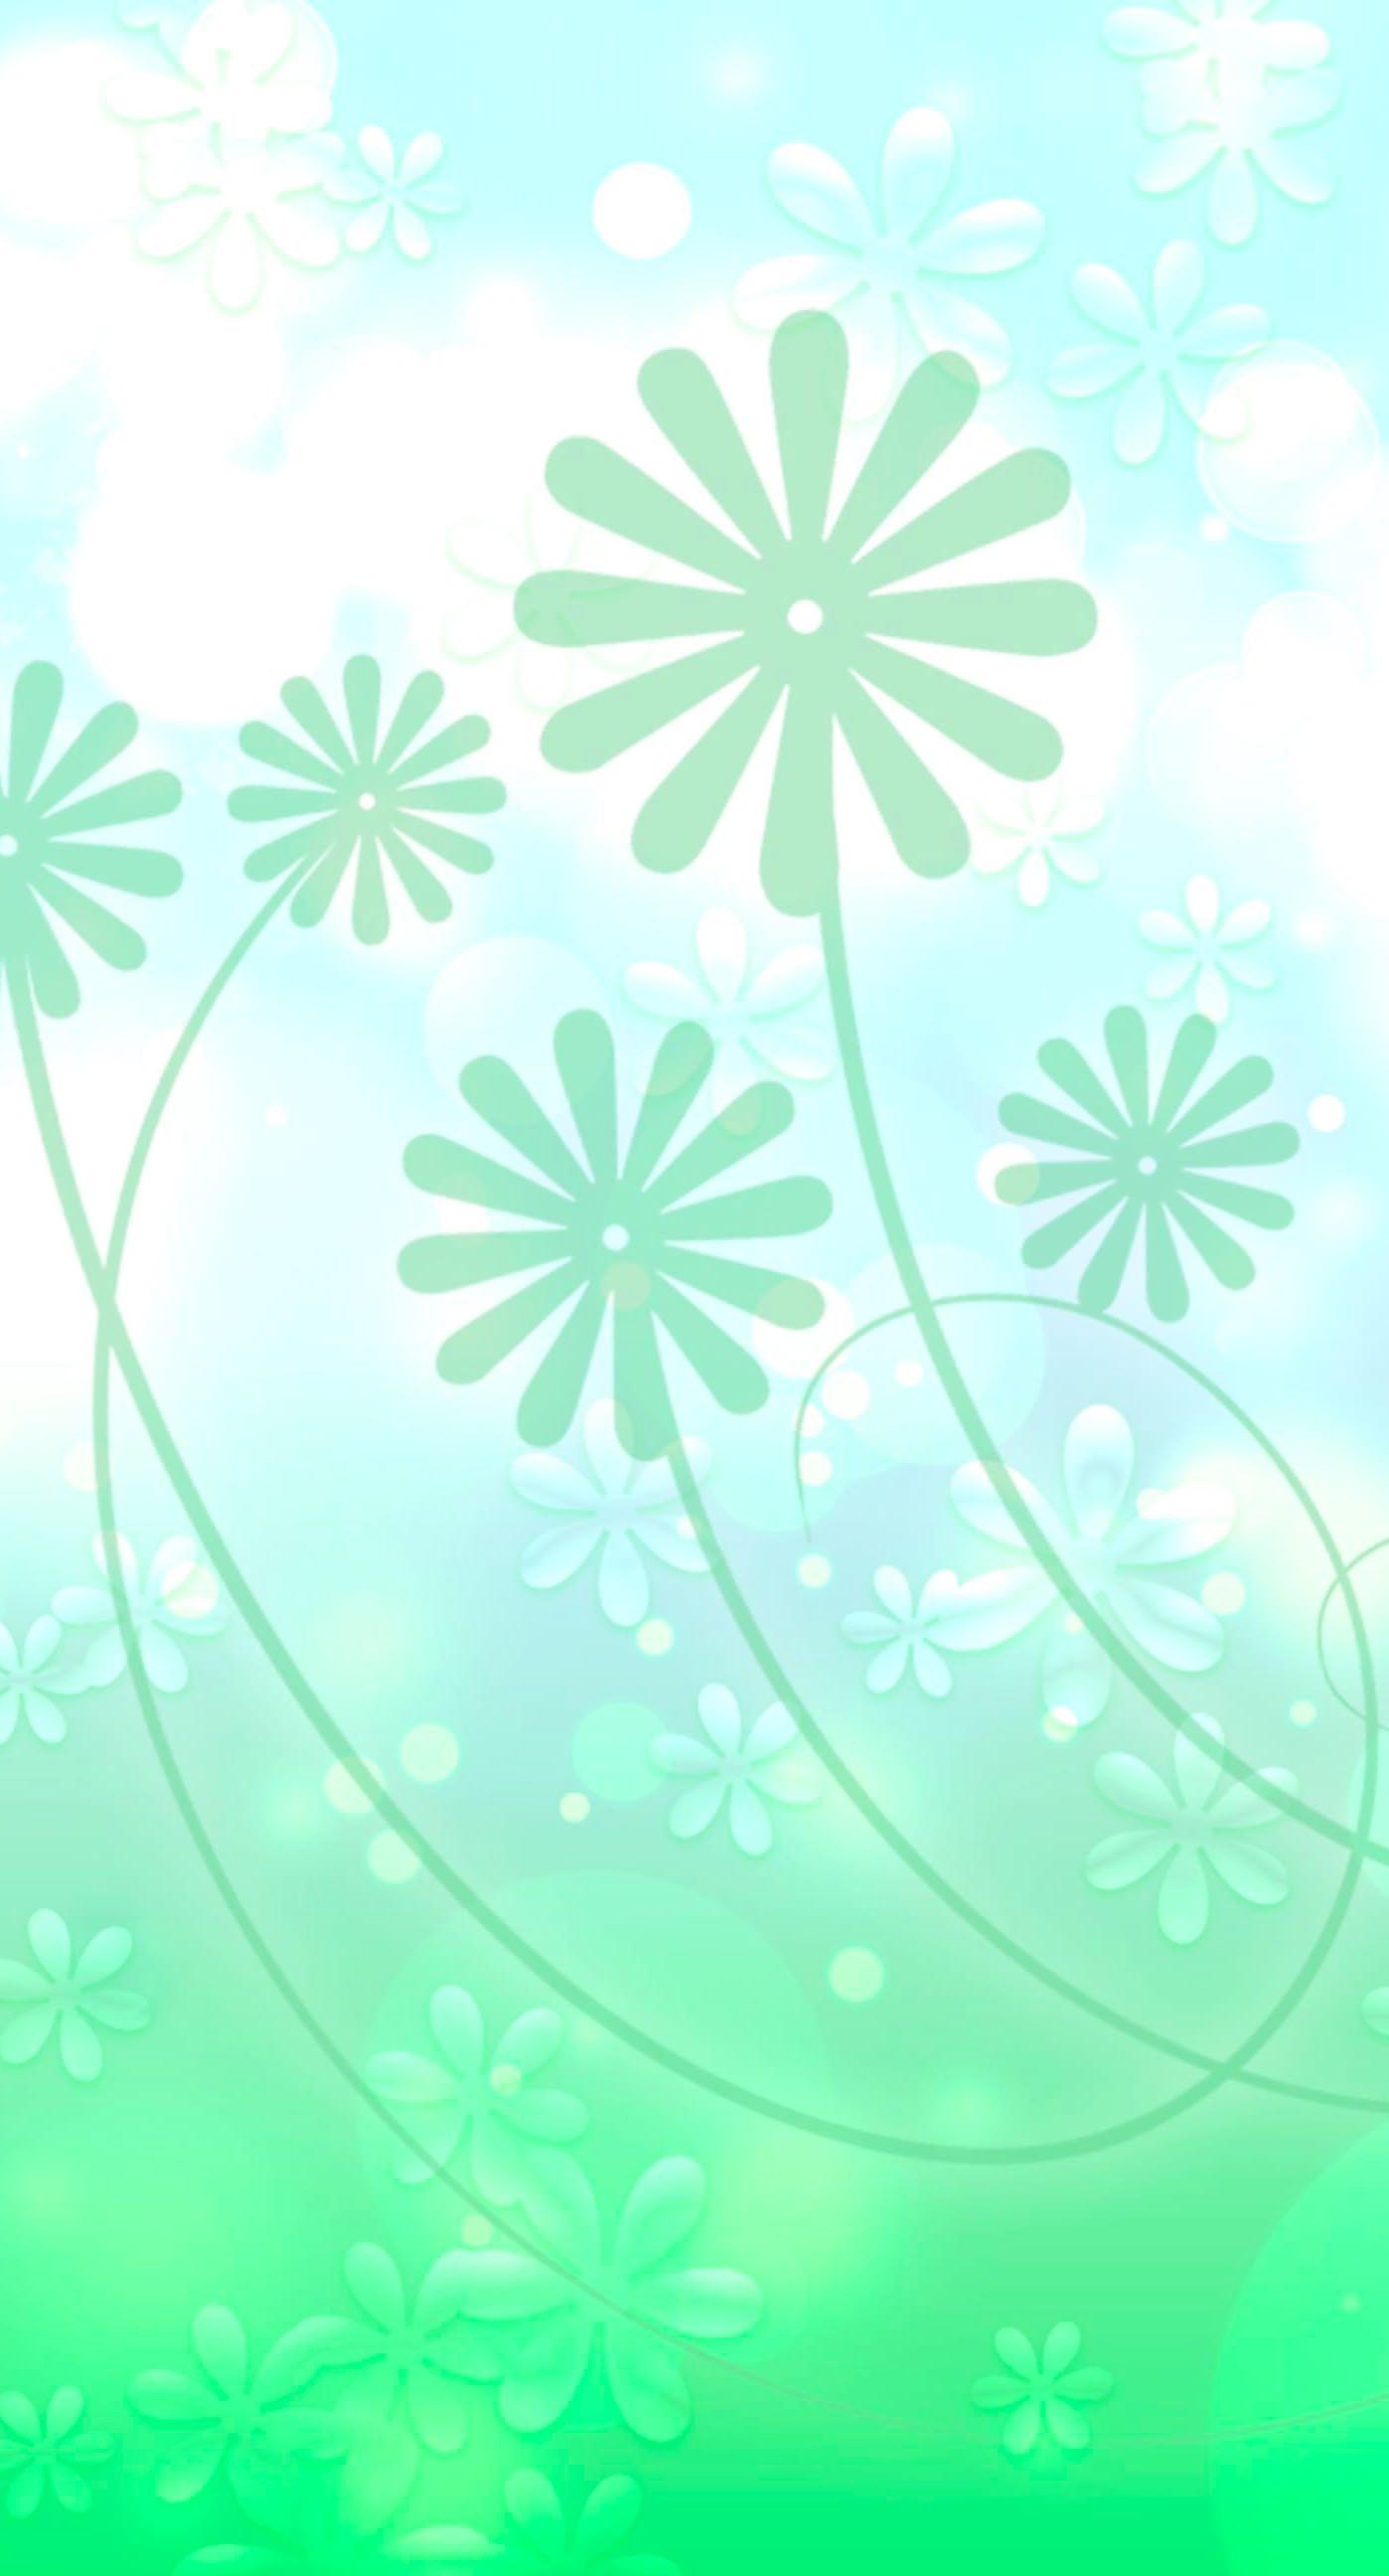 iphone8plus 1398x2592 wallpaper 01481